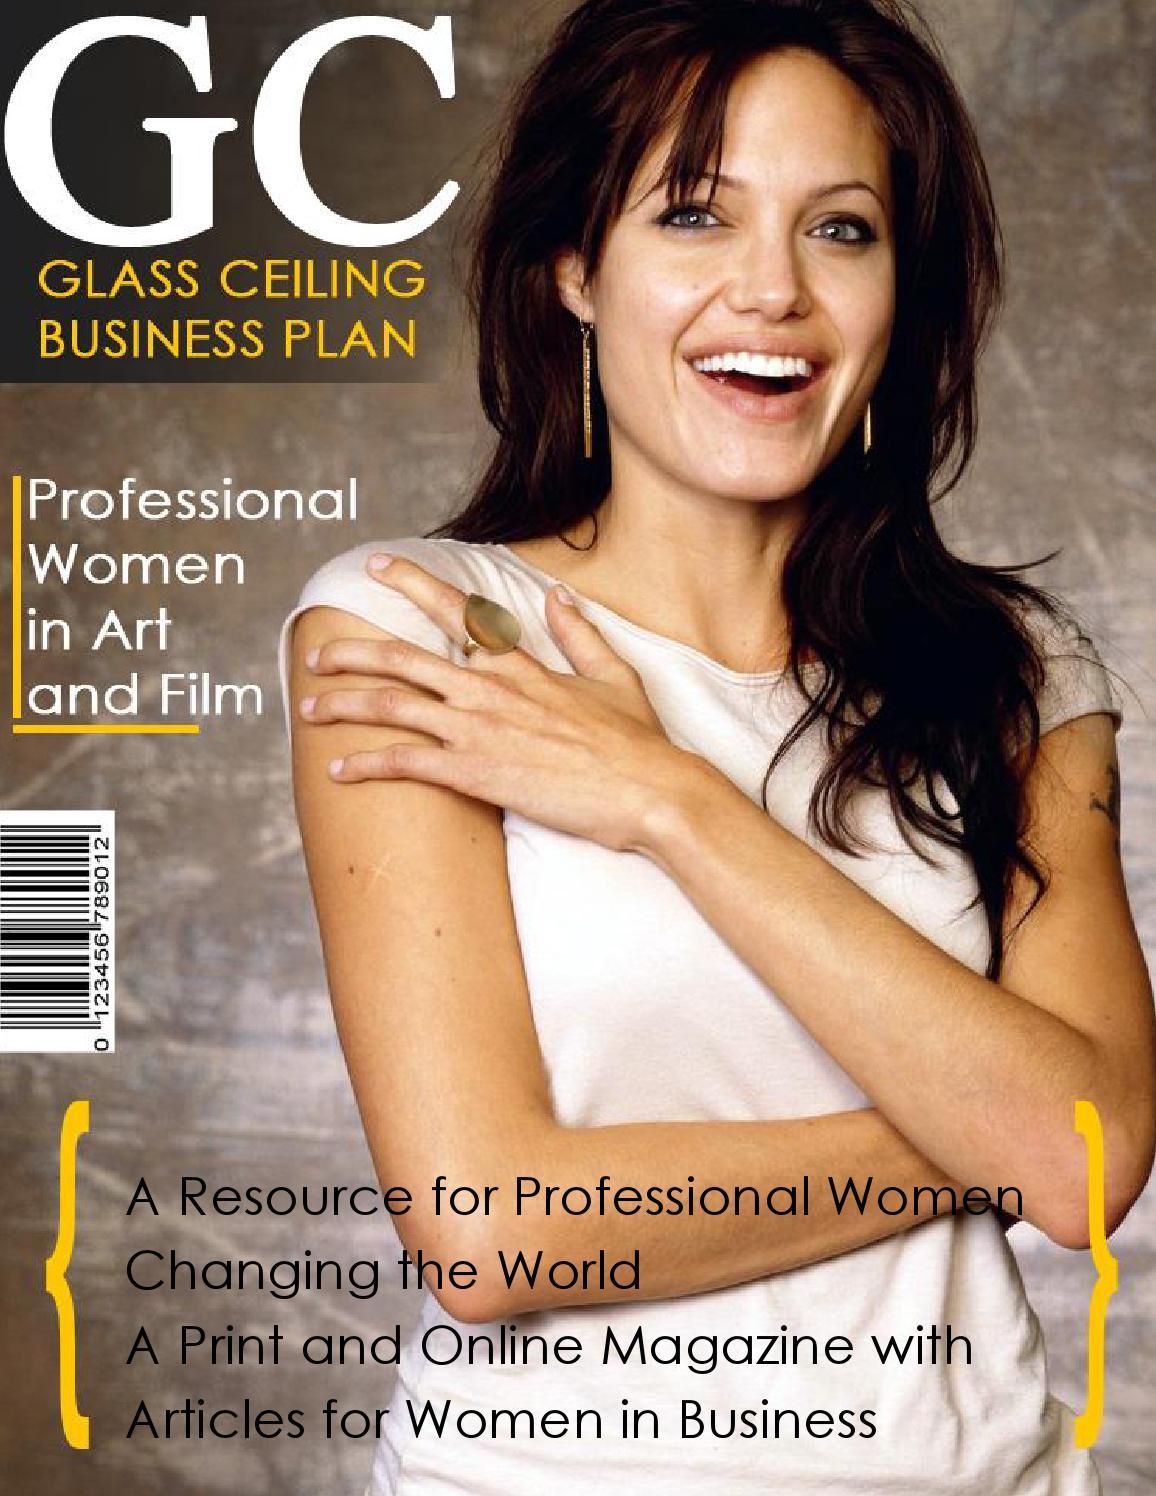 Magazine launch business plan ideas graphics coursework